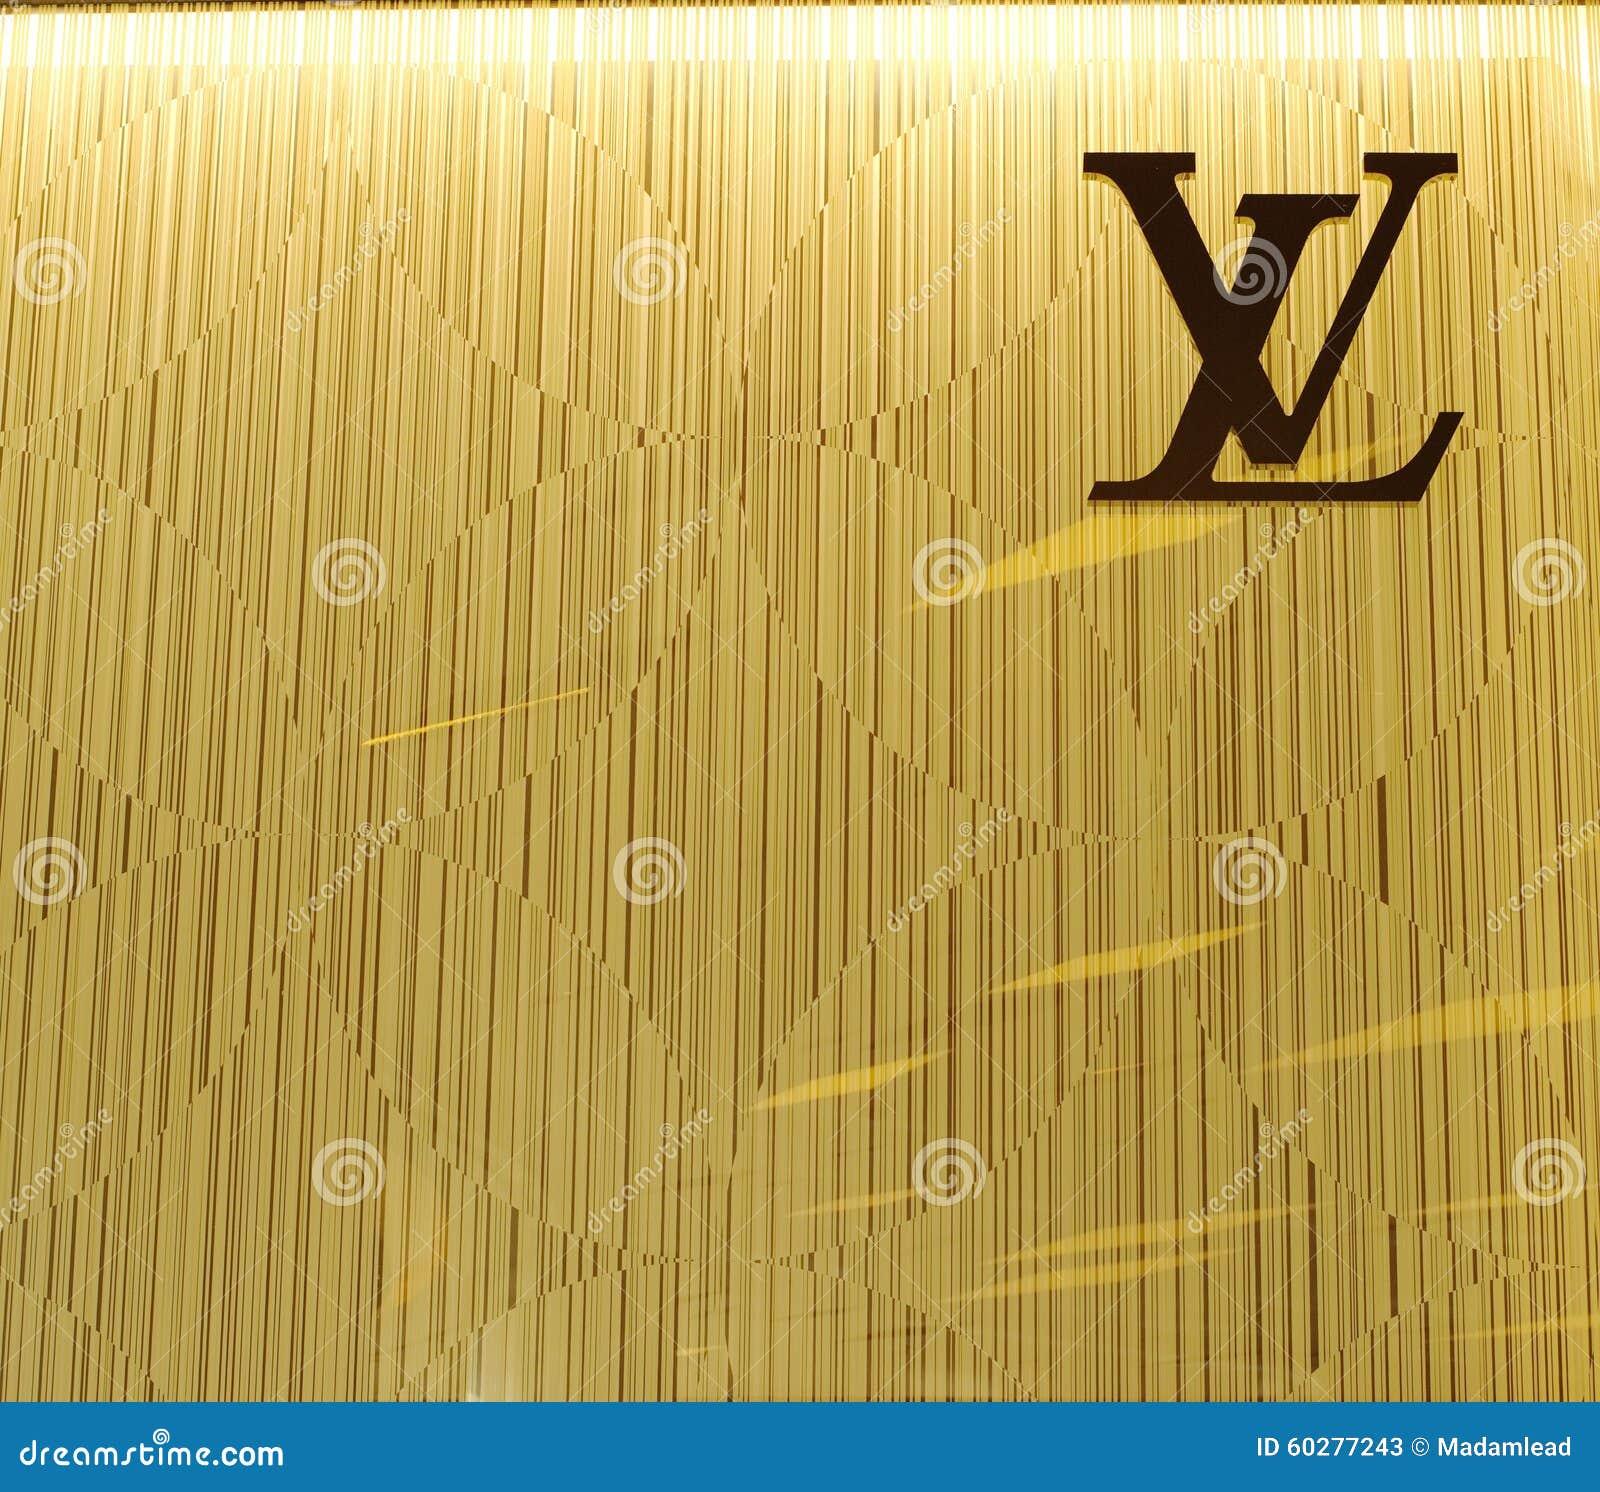 Lv Monogramme